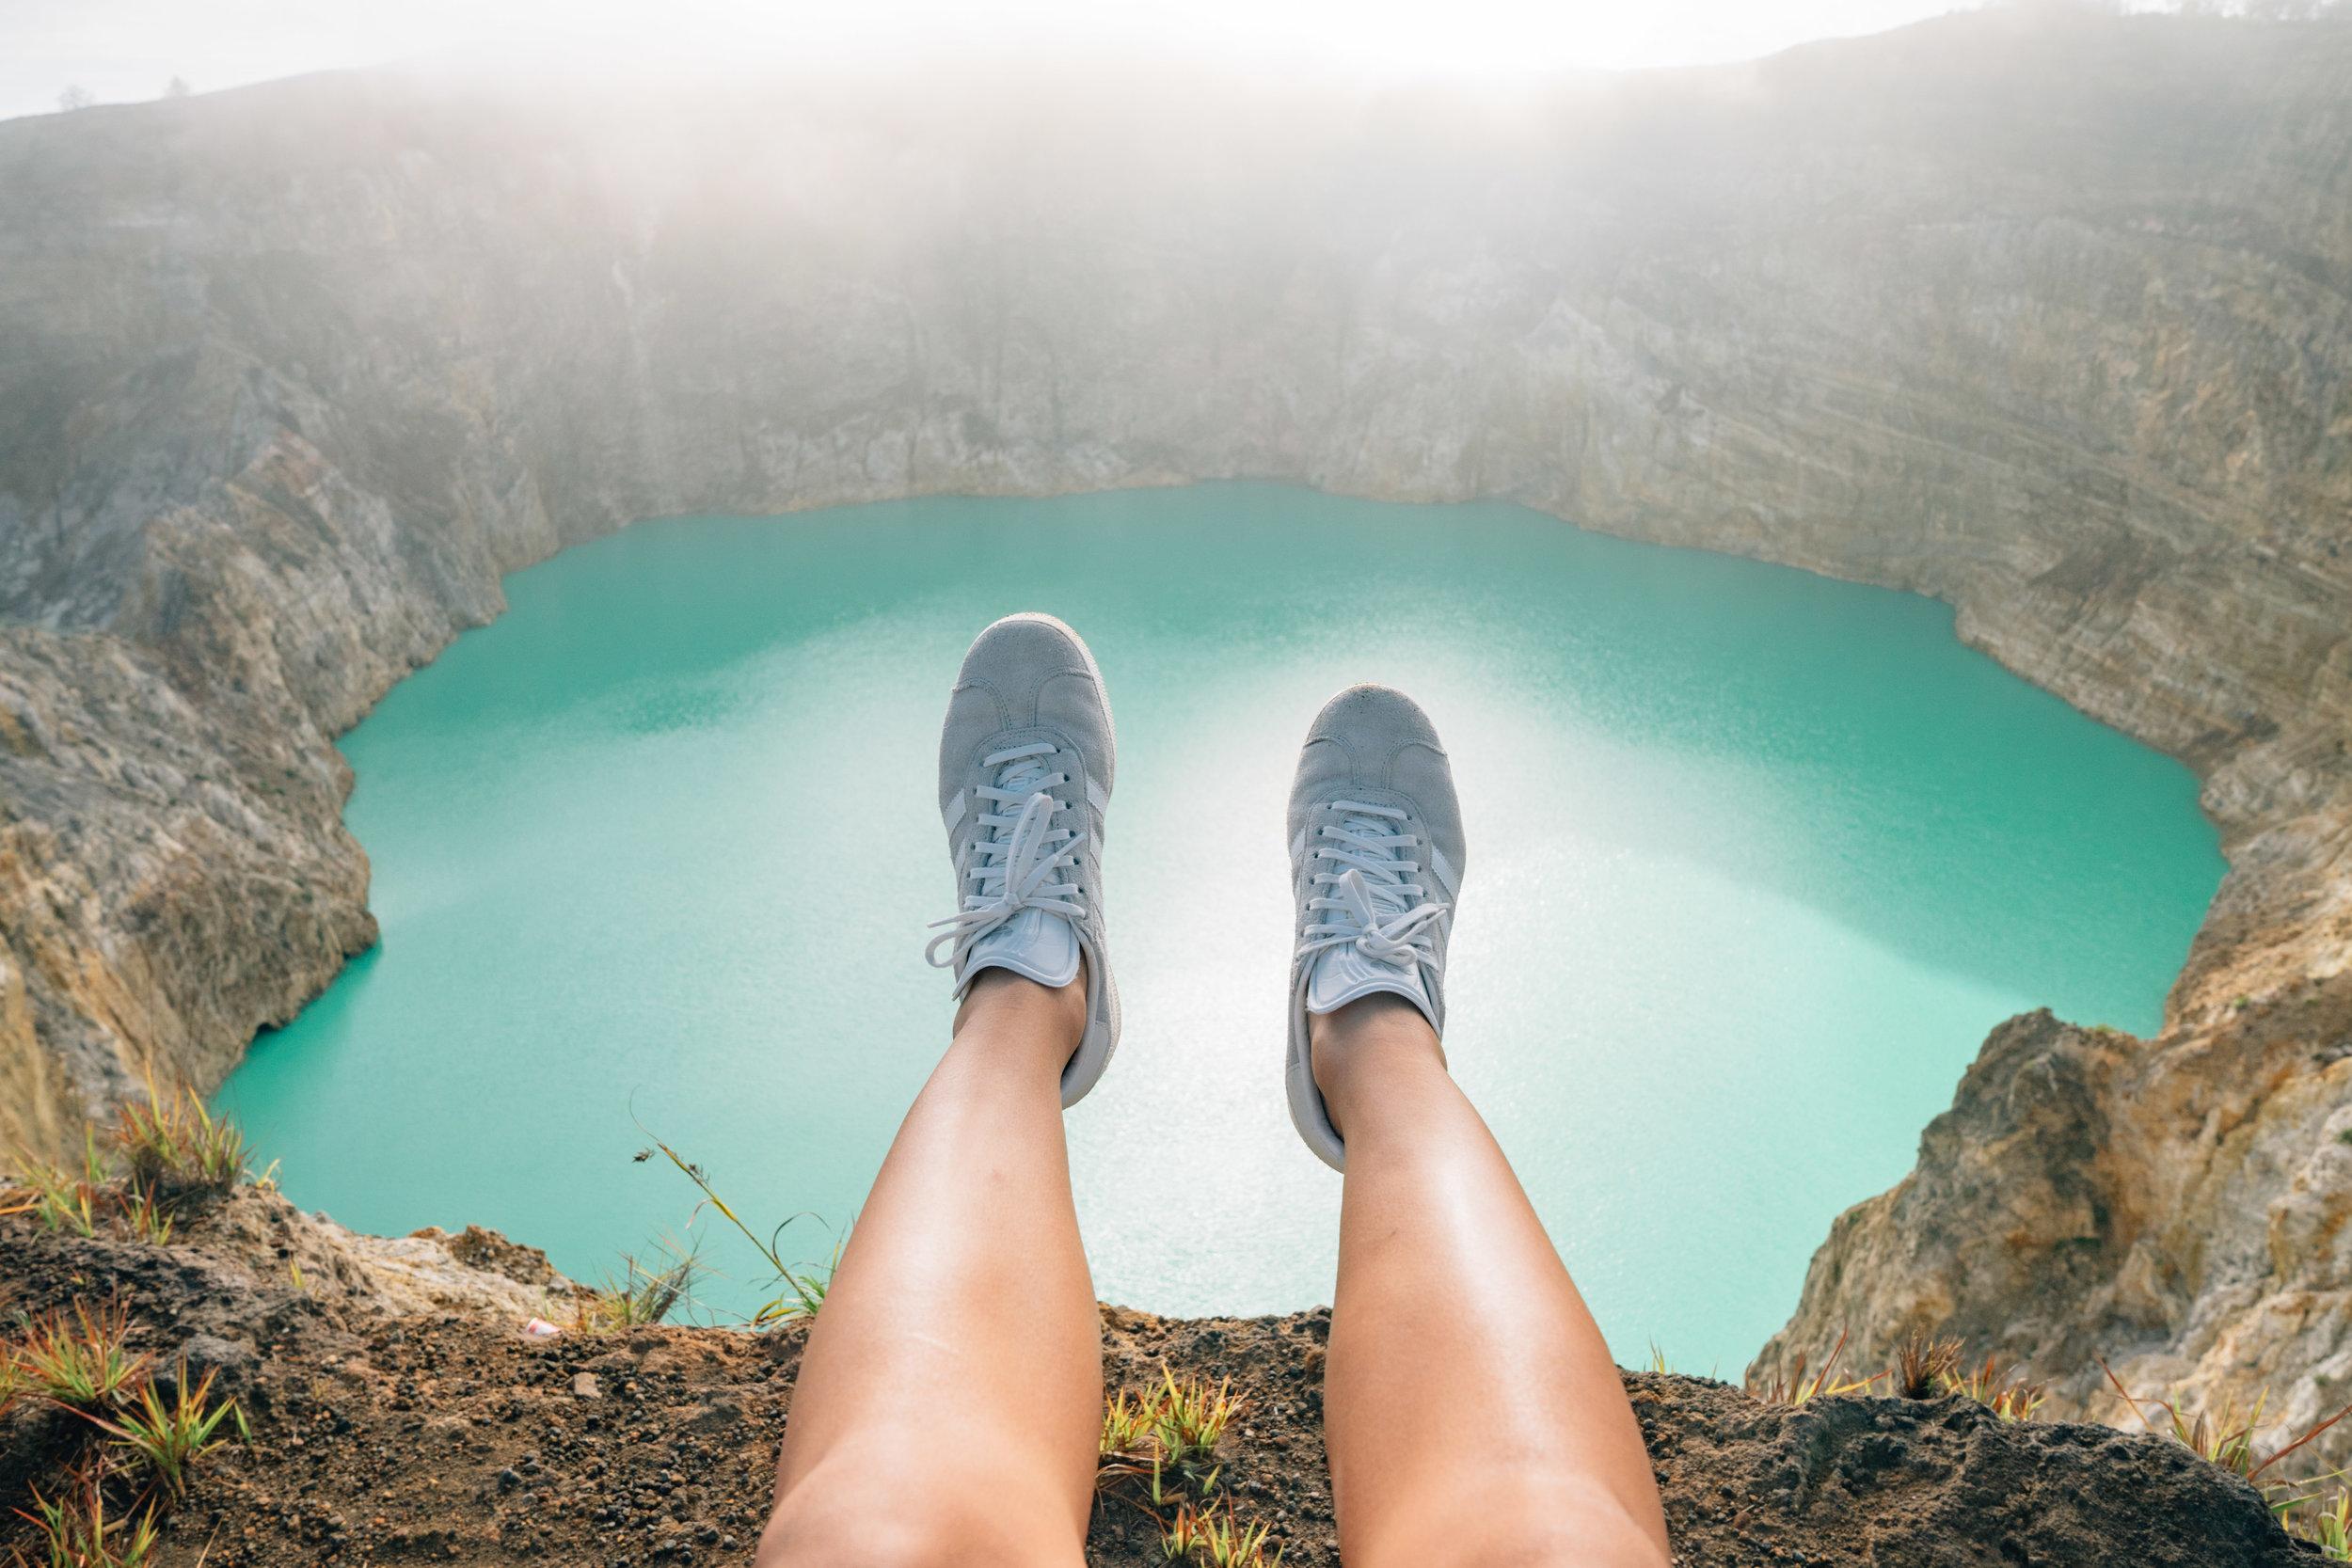 Tiwu Ata Polo - The Enchanted Lake